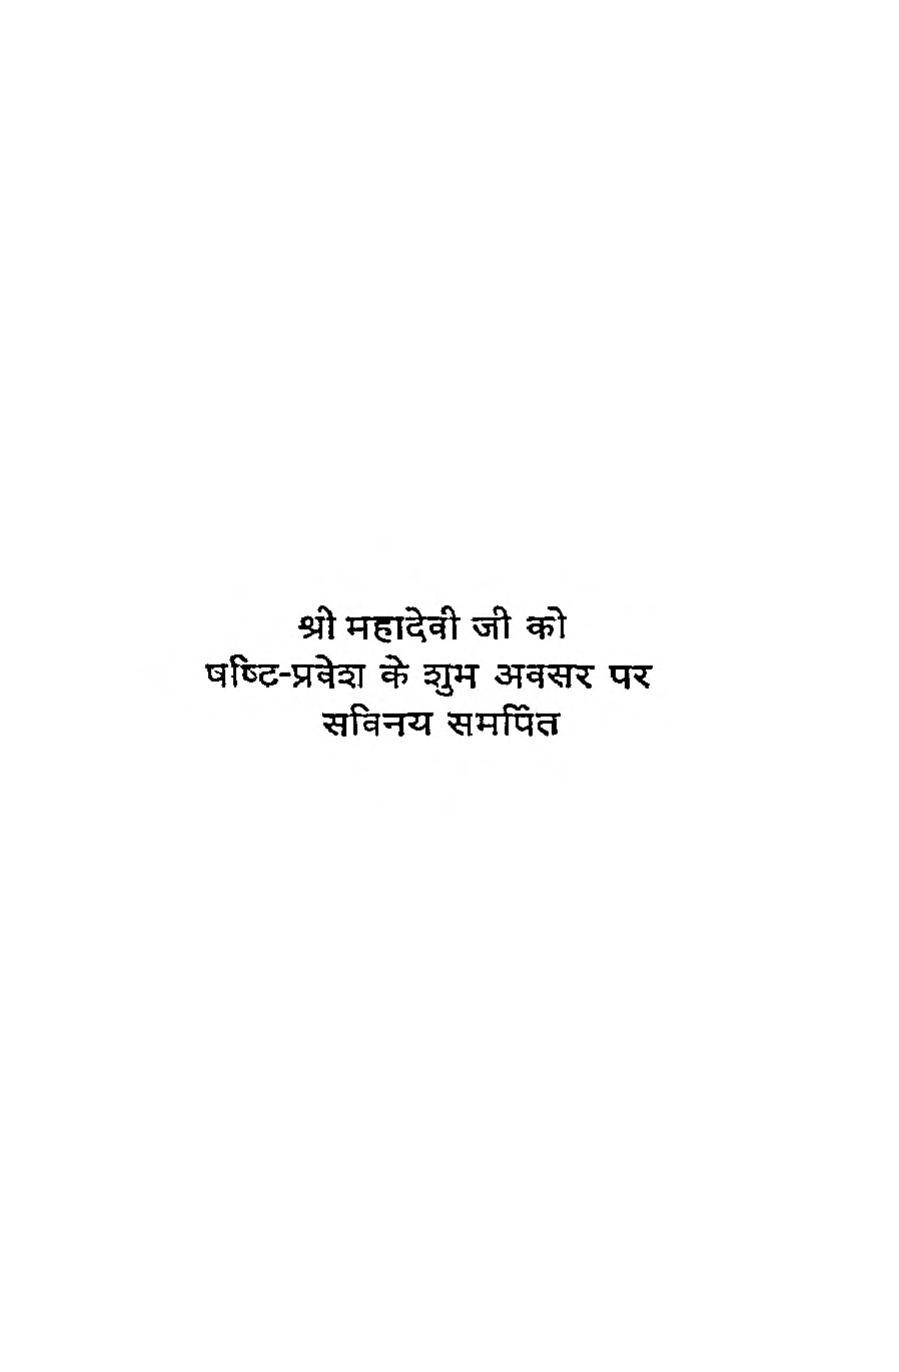 Book Image : महादेवी संस्मरण ग्रन्थ - Mahadevi Sansmaran Granth